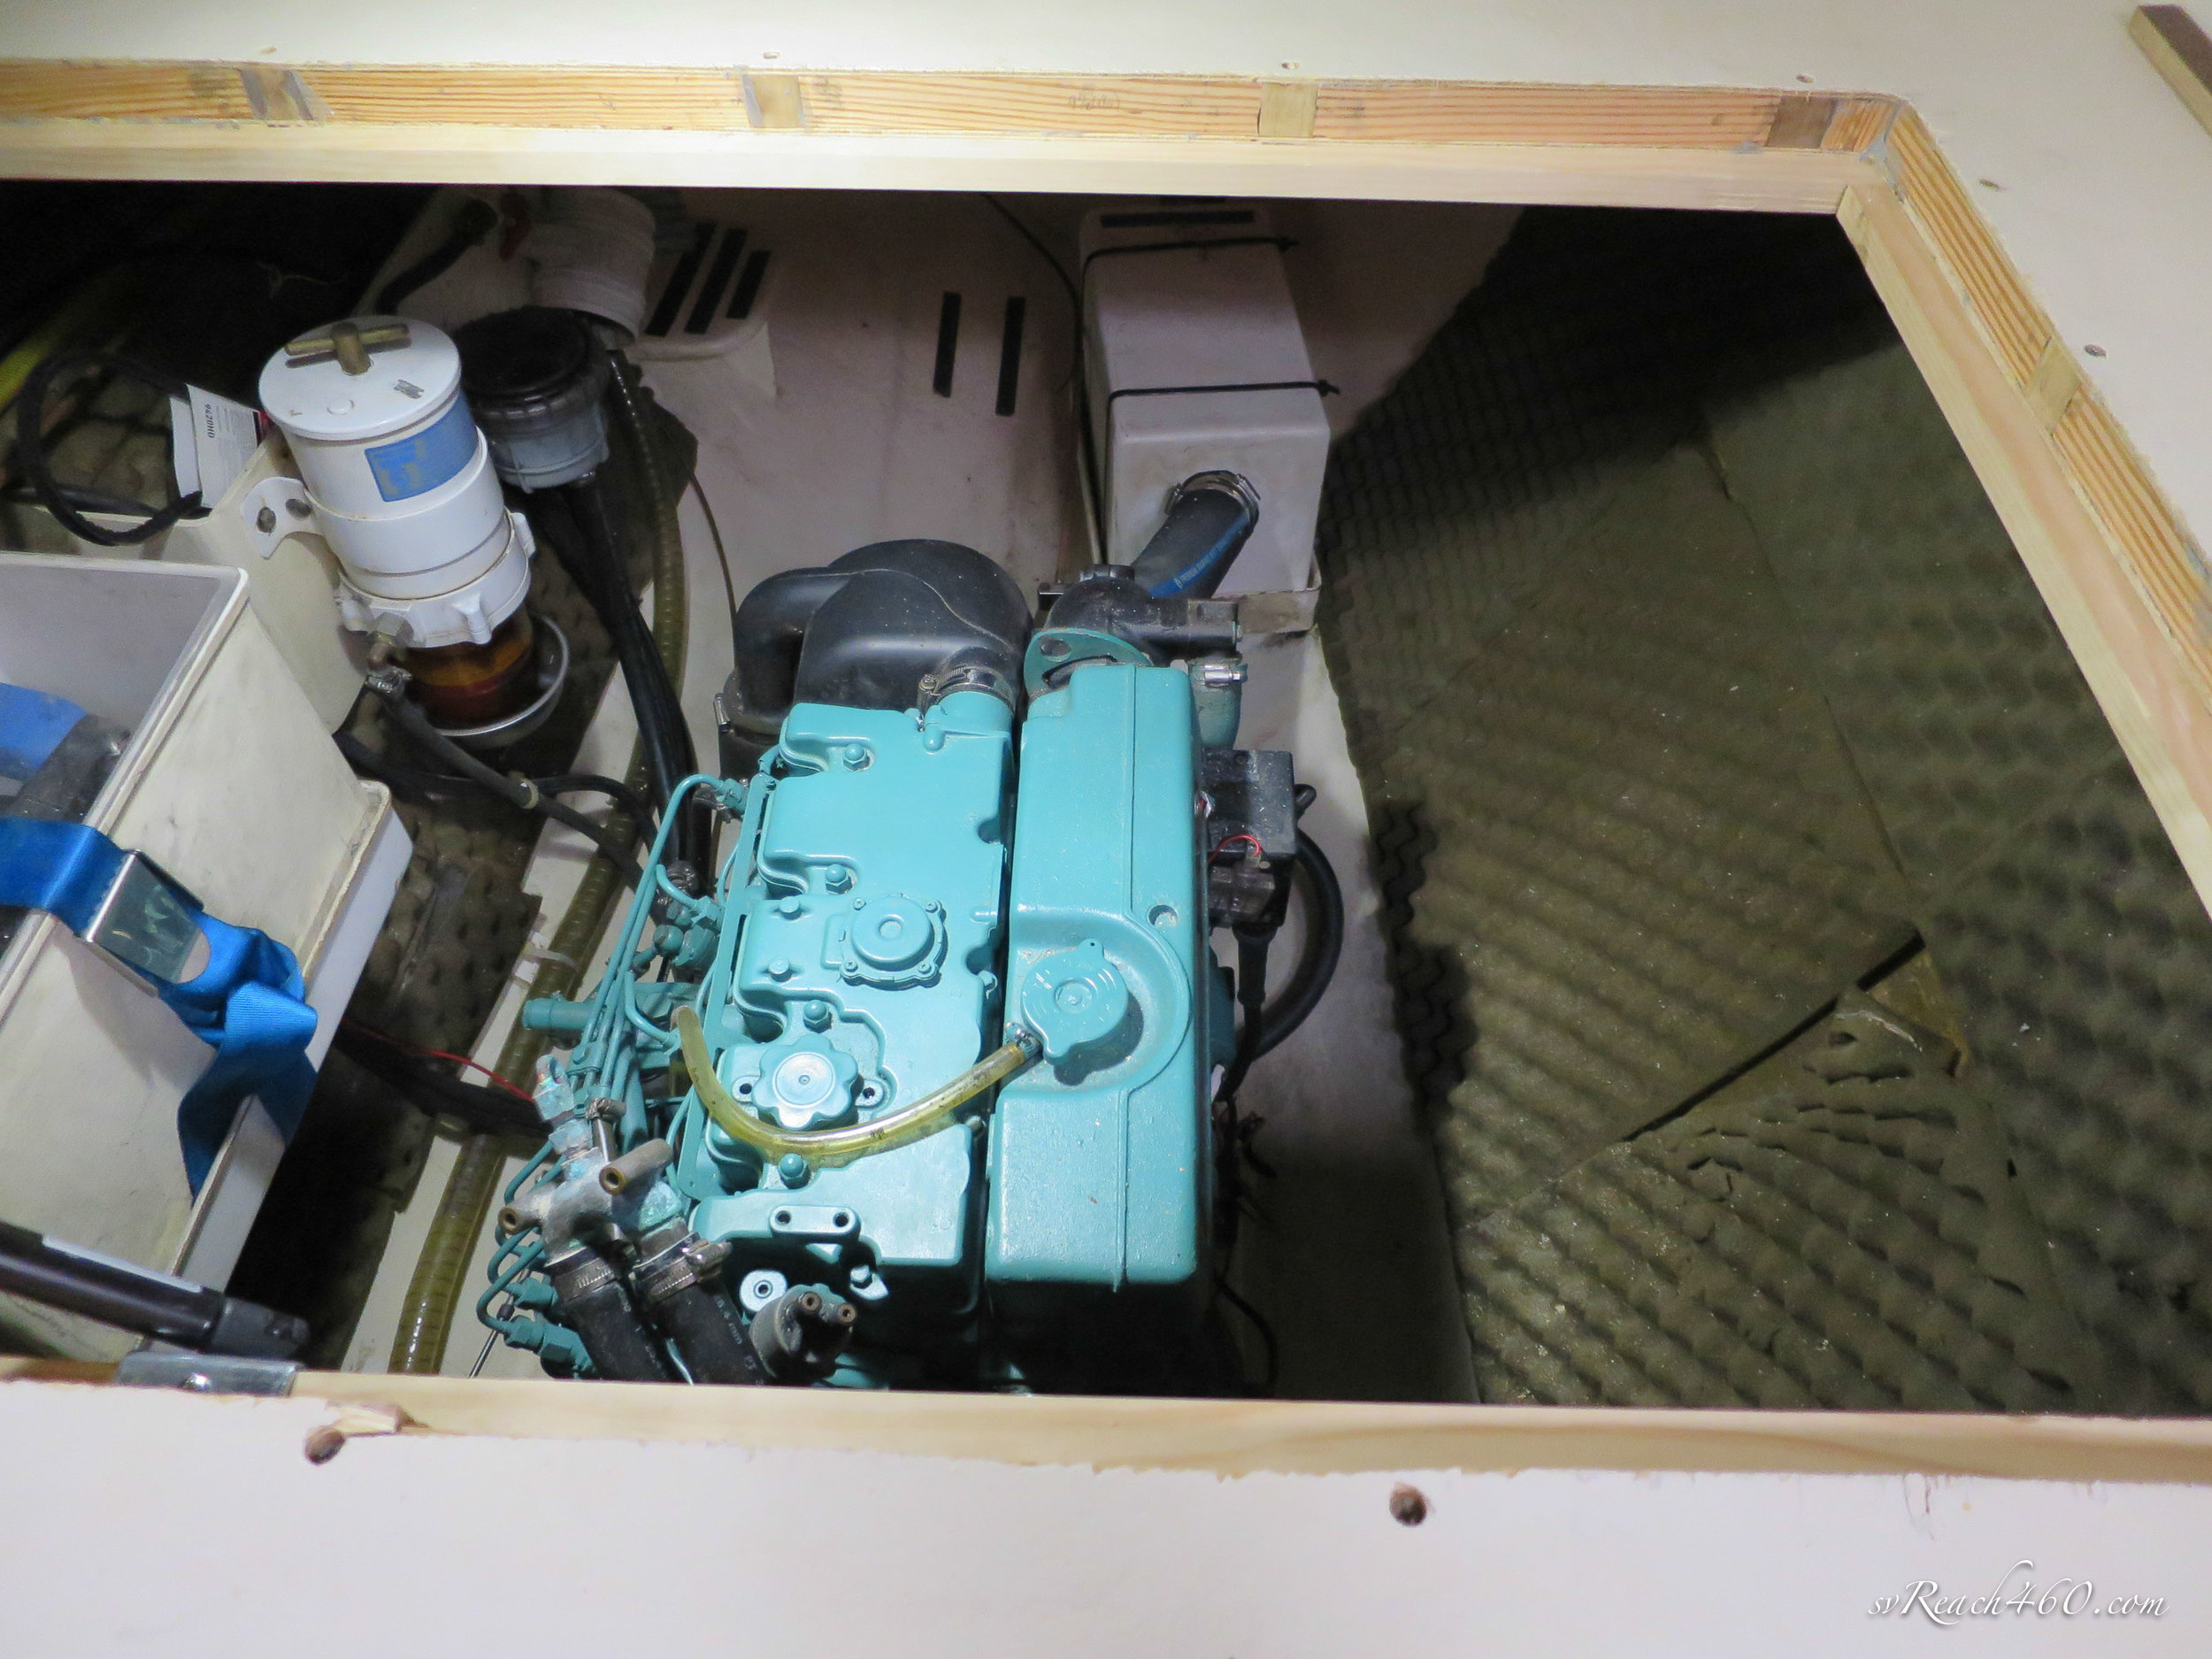 Engine access hatch